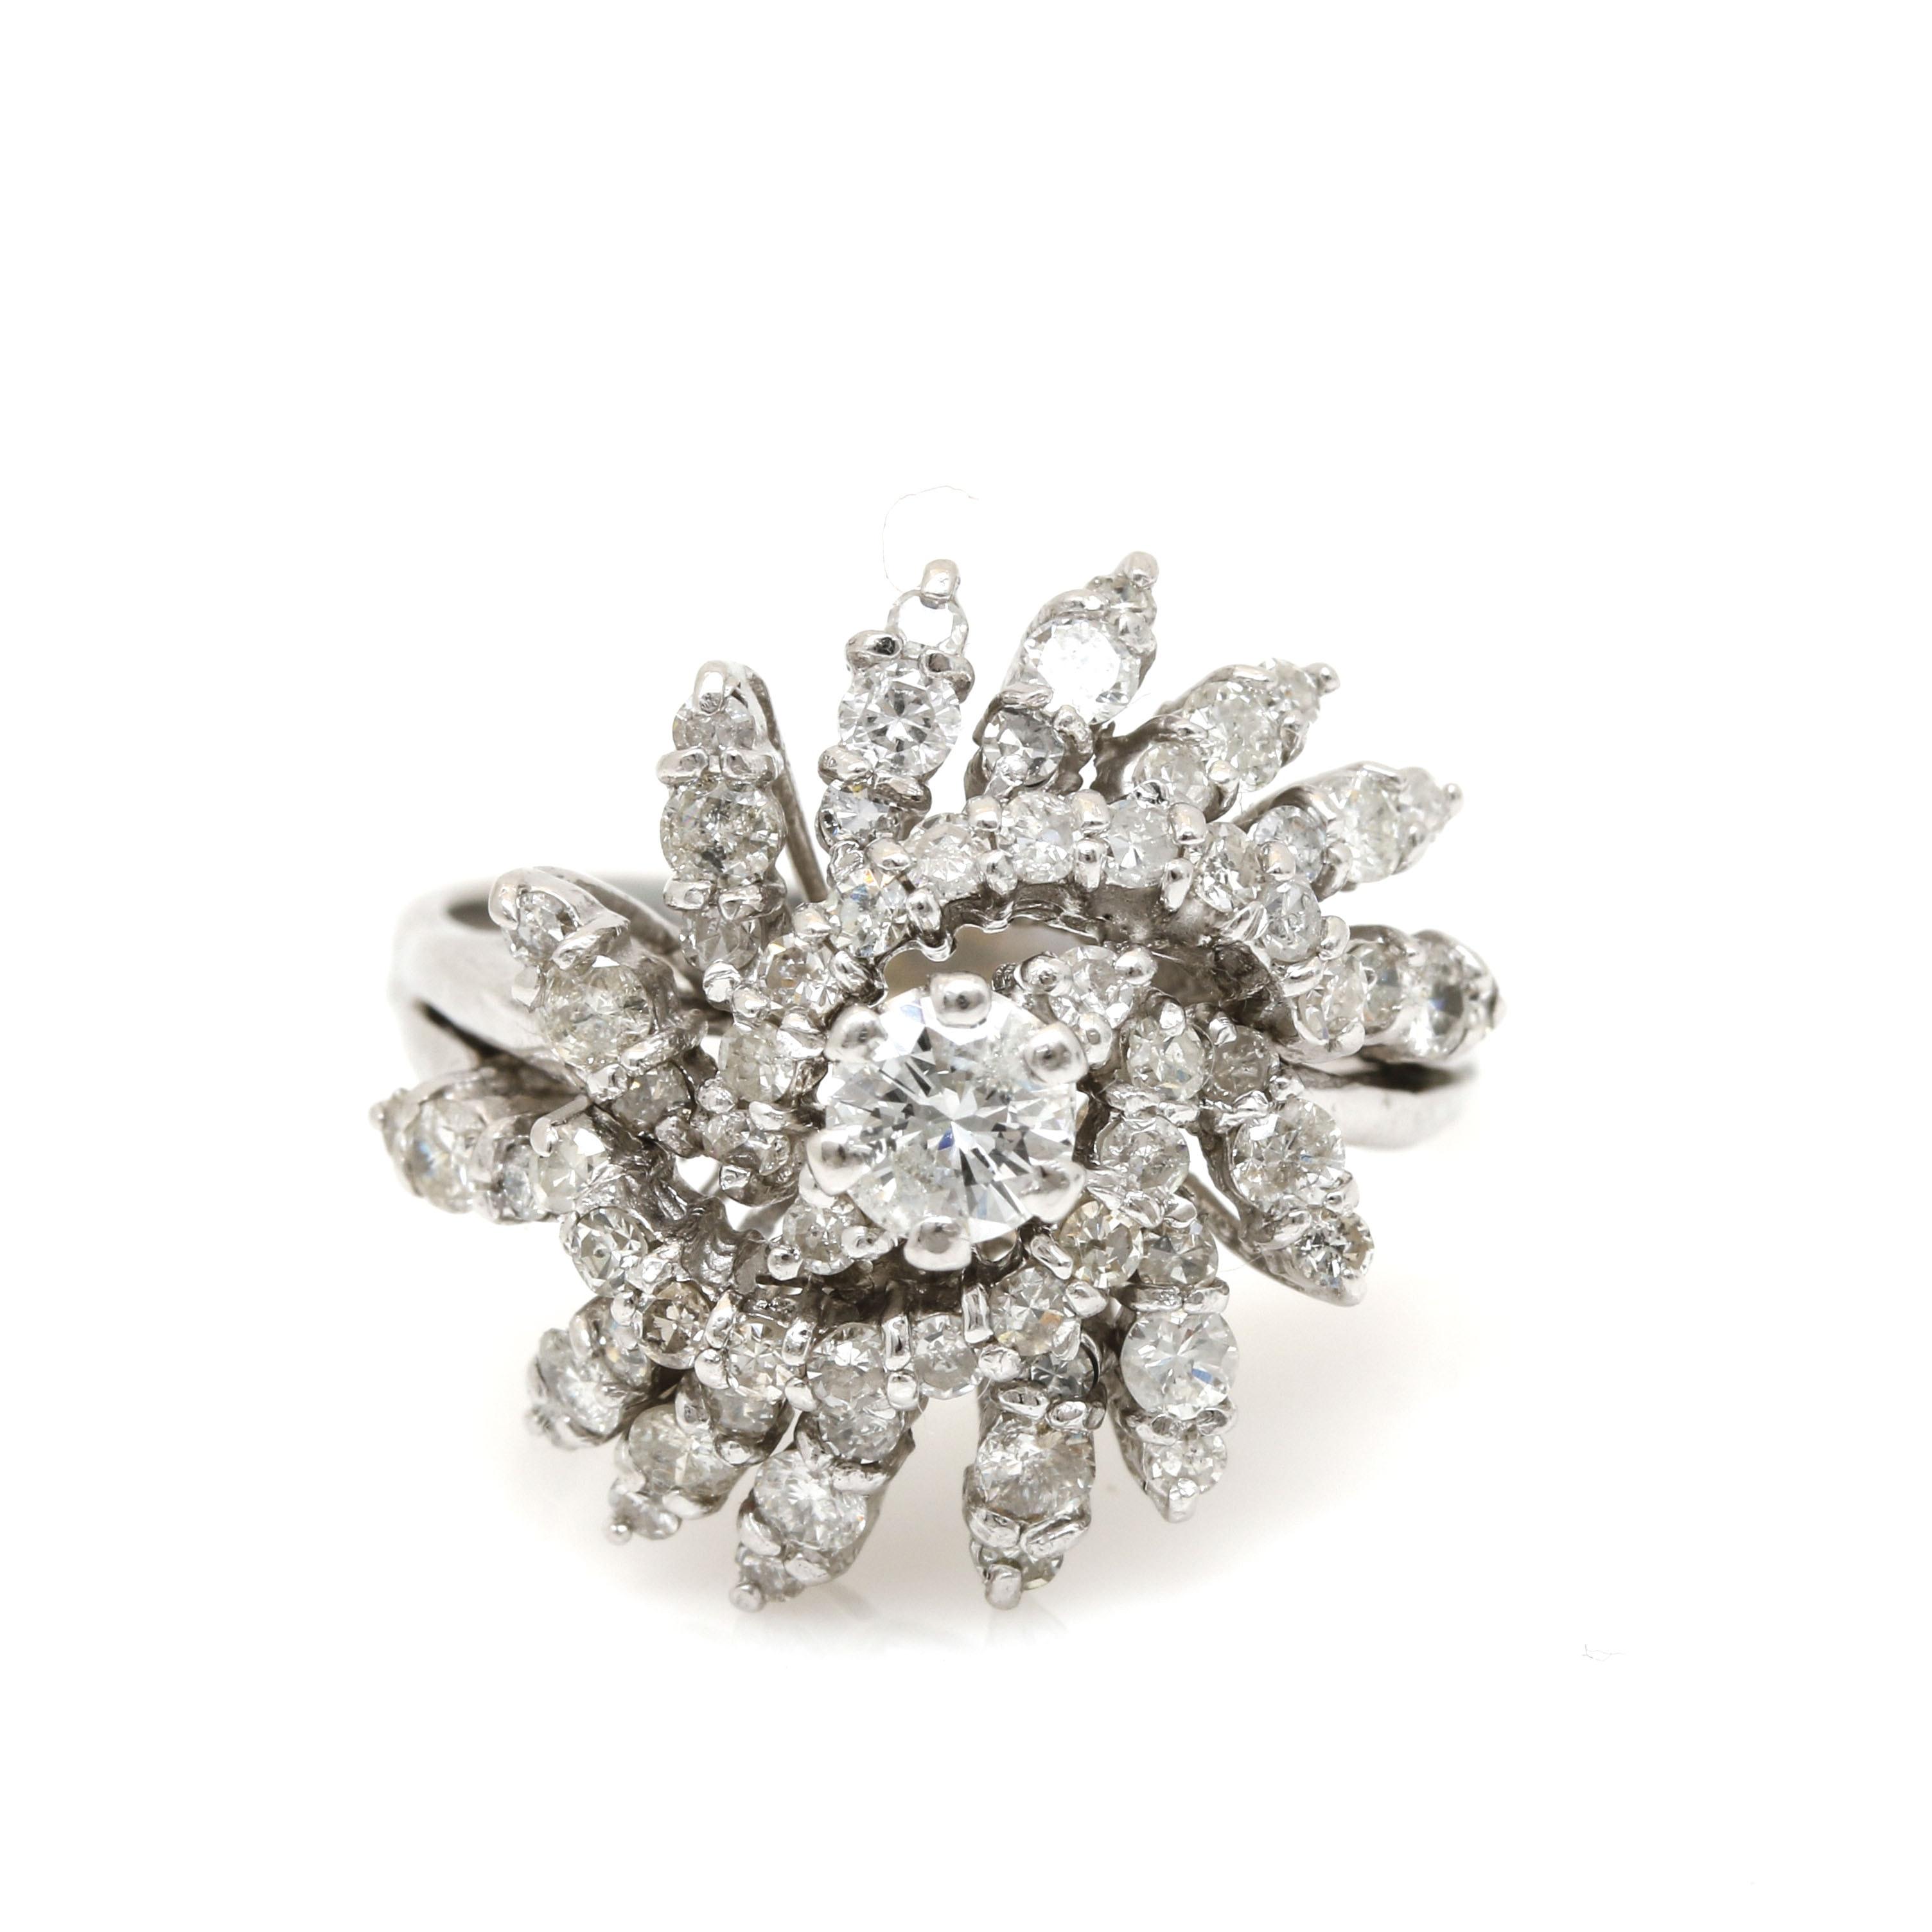 14K White Gold 2.09 CTW Diamond Ring